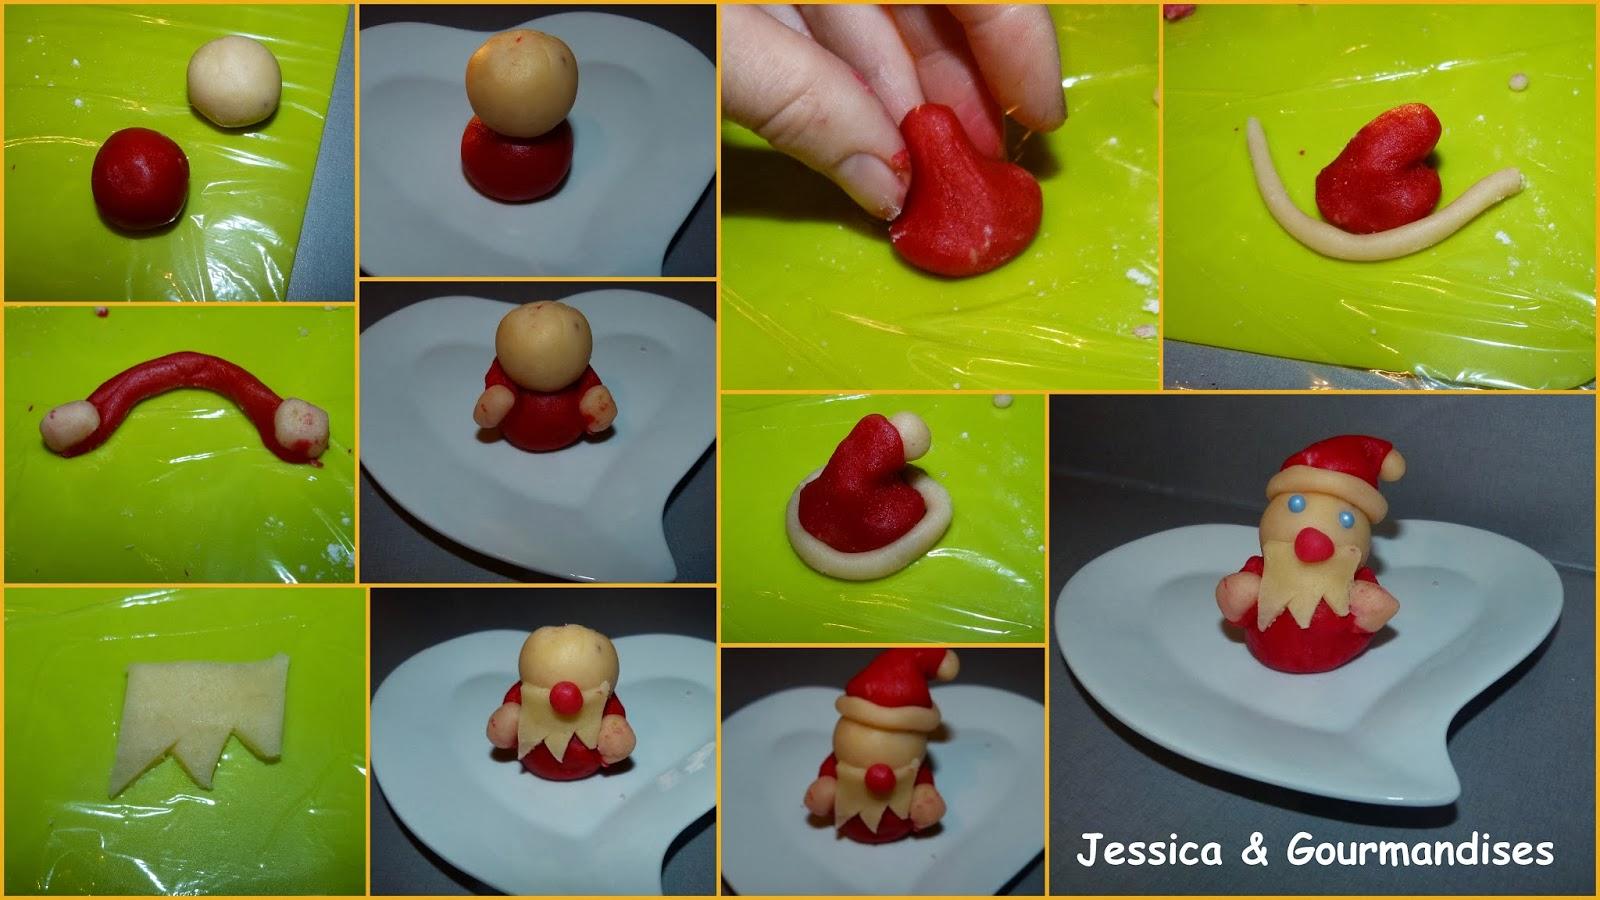 Jessica Gourmandises Decoration Pere Noel En Pate D Amande